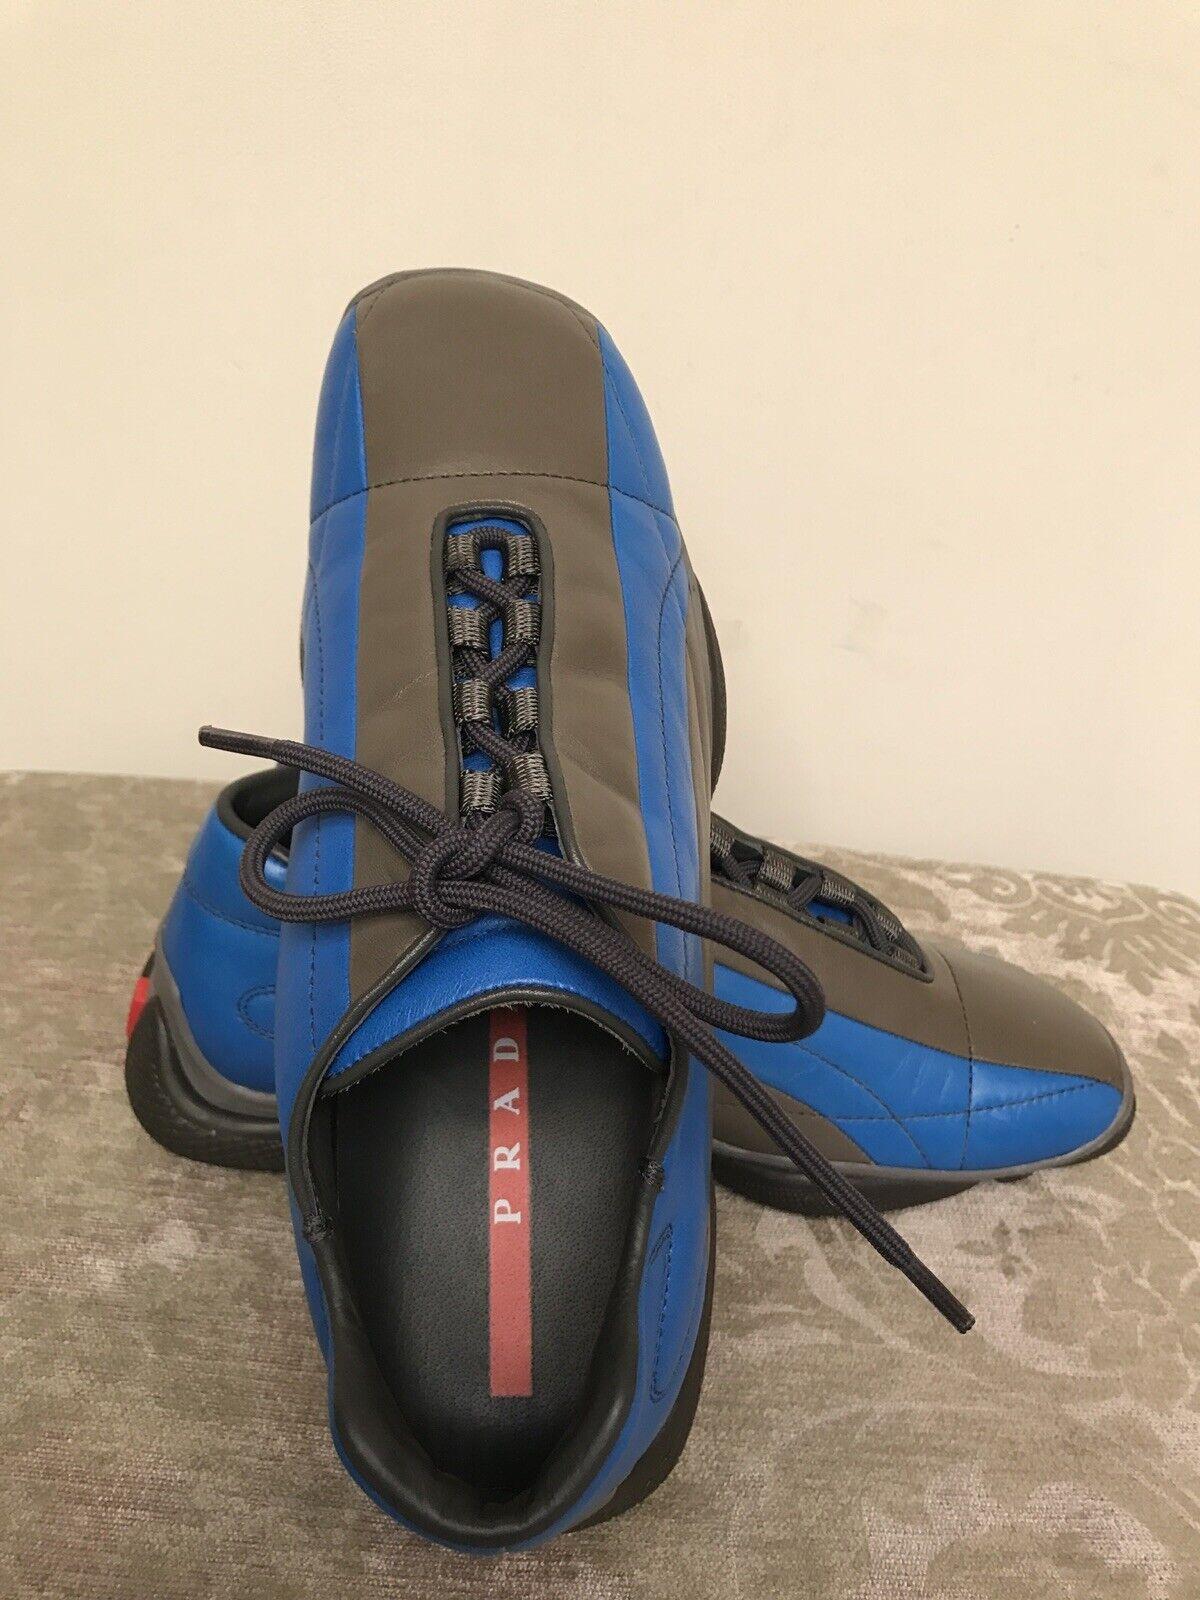 Prada Sport Bicolor Grey    Cobalt color Womens Leather shoes Size 8 US New  5d28f5